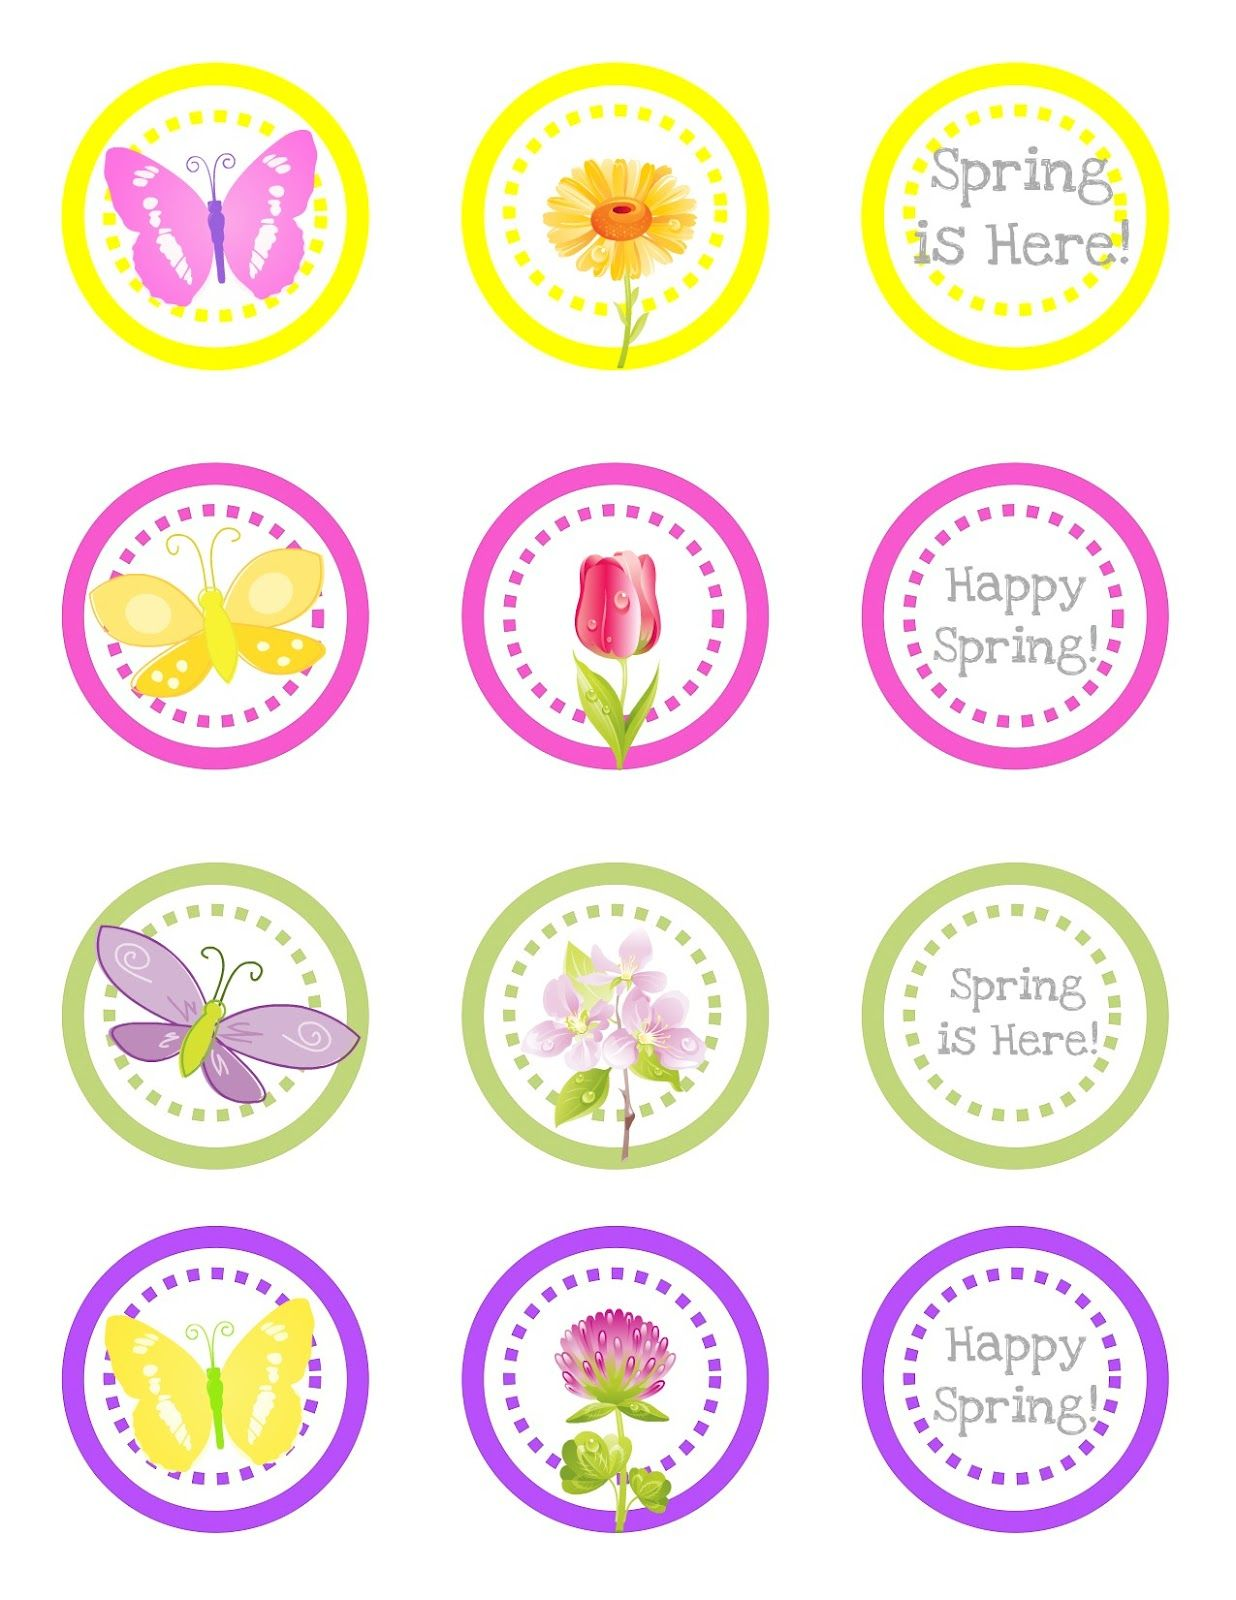 {FREE PRINTABLE} april showers bring may flowers printable ...